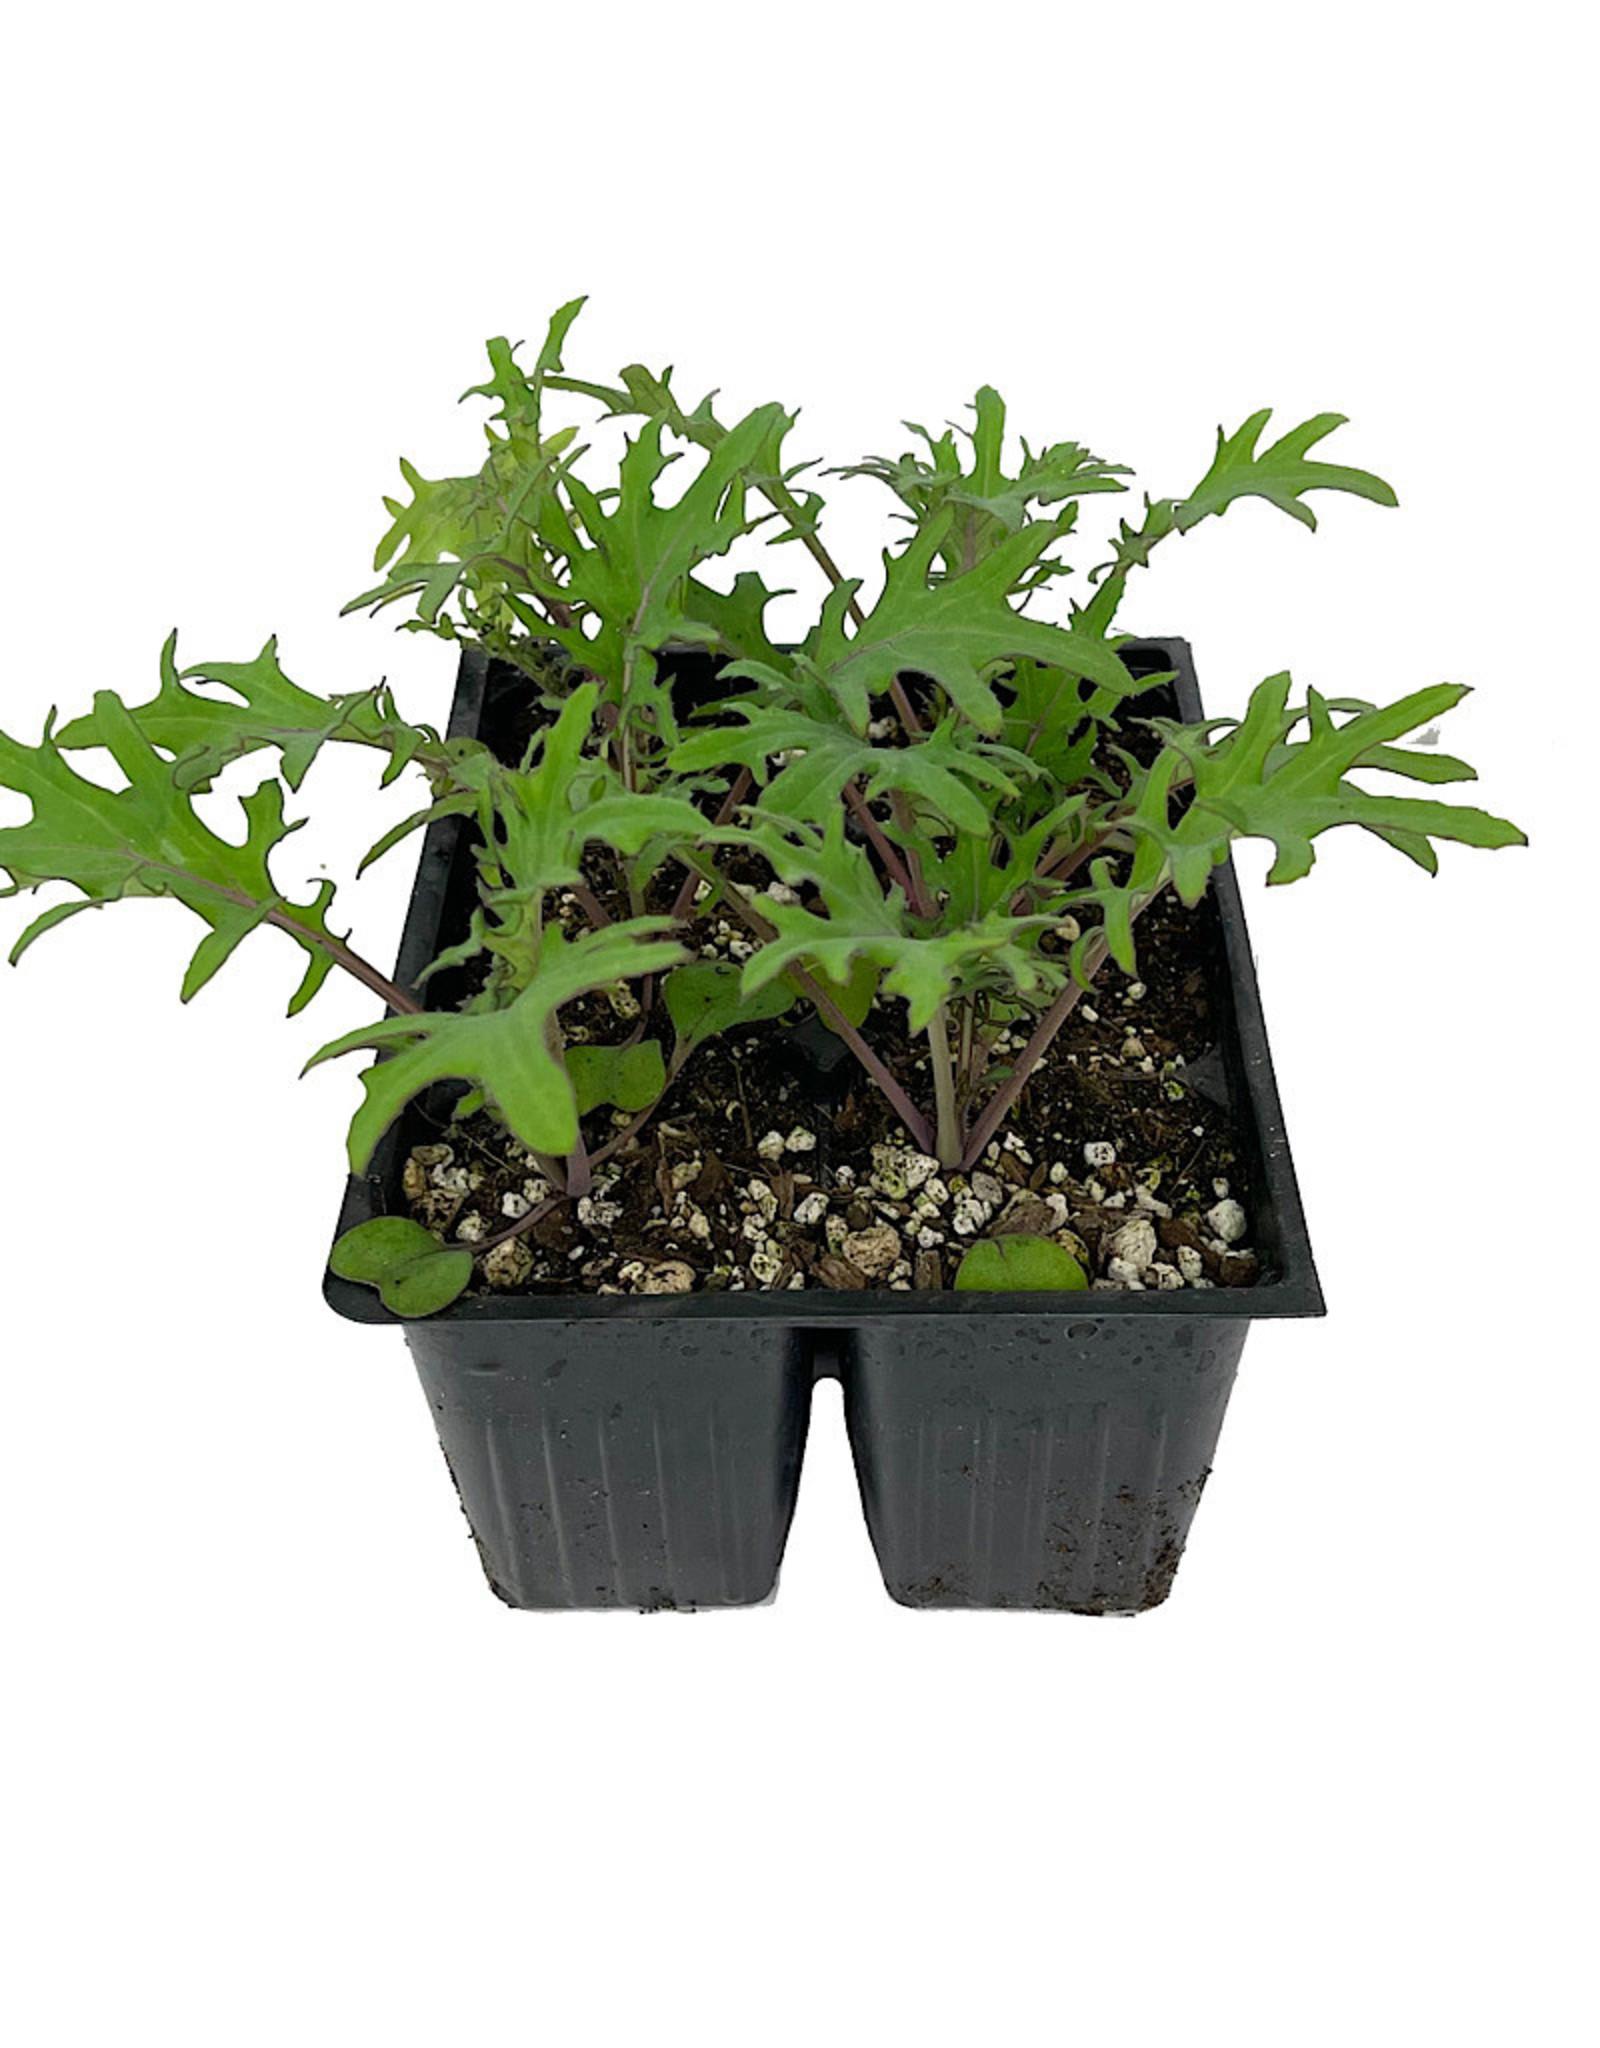 Kale 'Red Russian' Jumbo Traypack